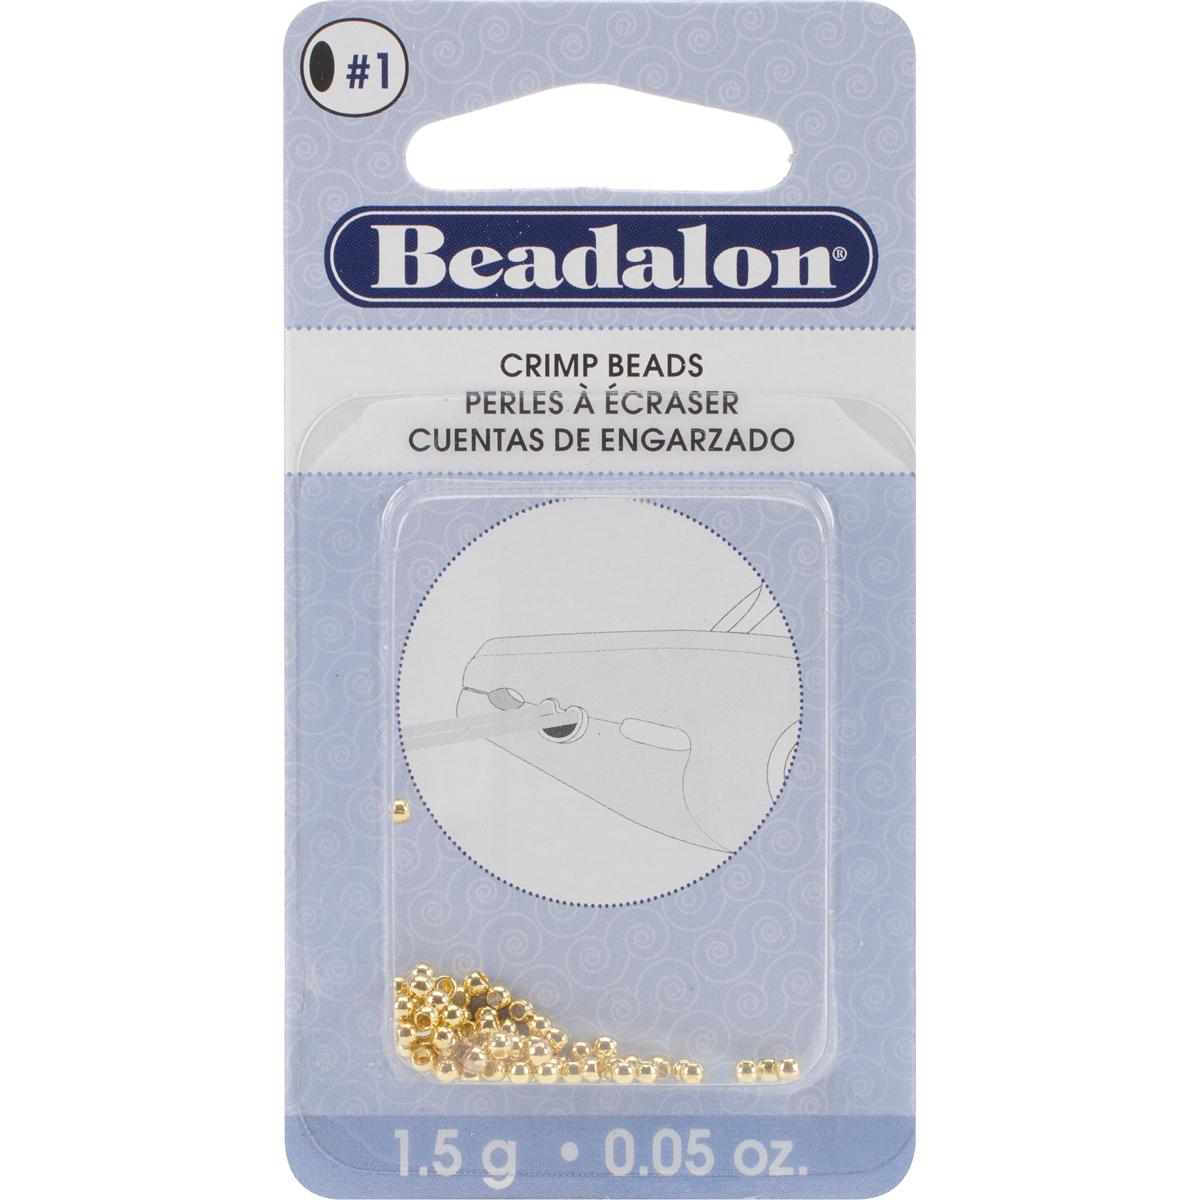 1.5 Grm Bag Crimp Beads 2mm G